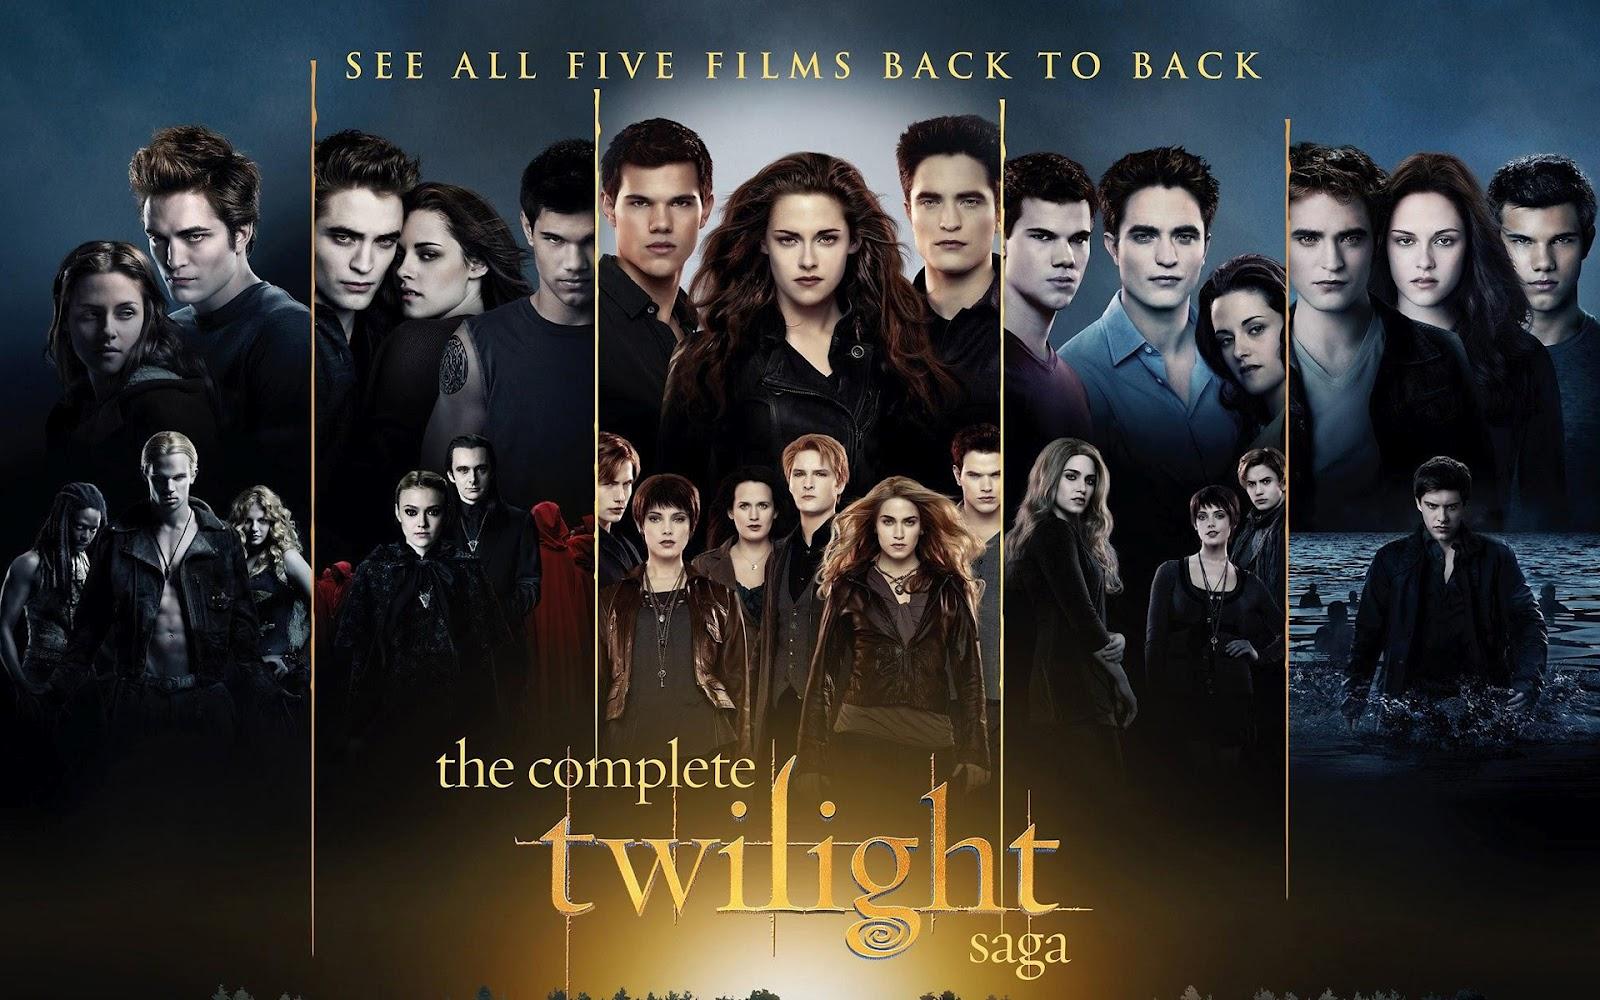 http://4.bp.blogspot.com/-6CyEF7pW4GM/UF6uVIo6OaI/AAAAAAAADVw/h4sTu6j99O0/s1600/the_complete_twilight_saga-wide.jpg